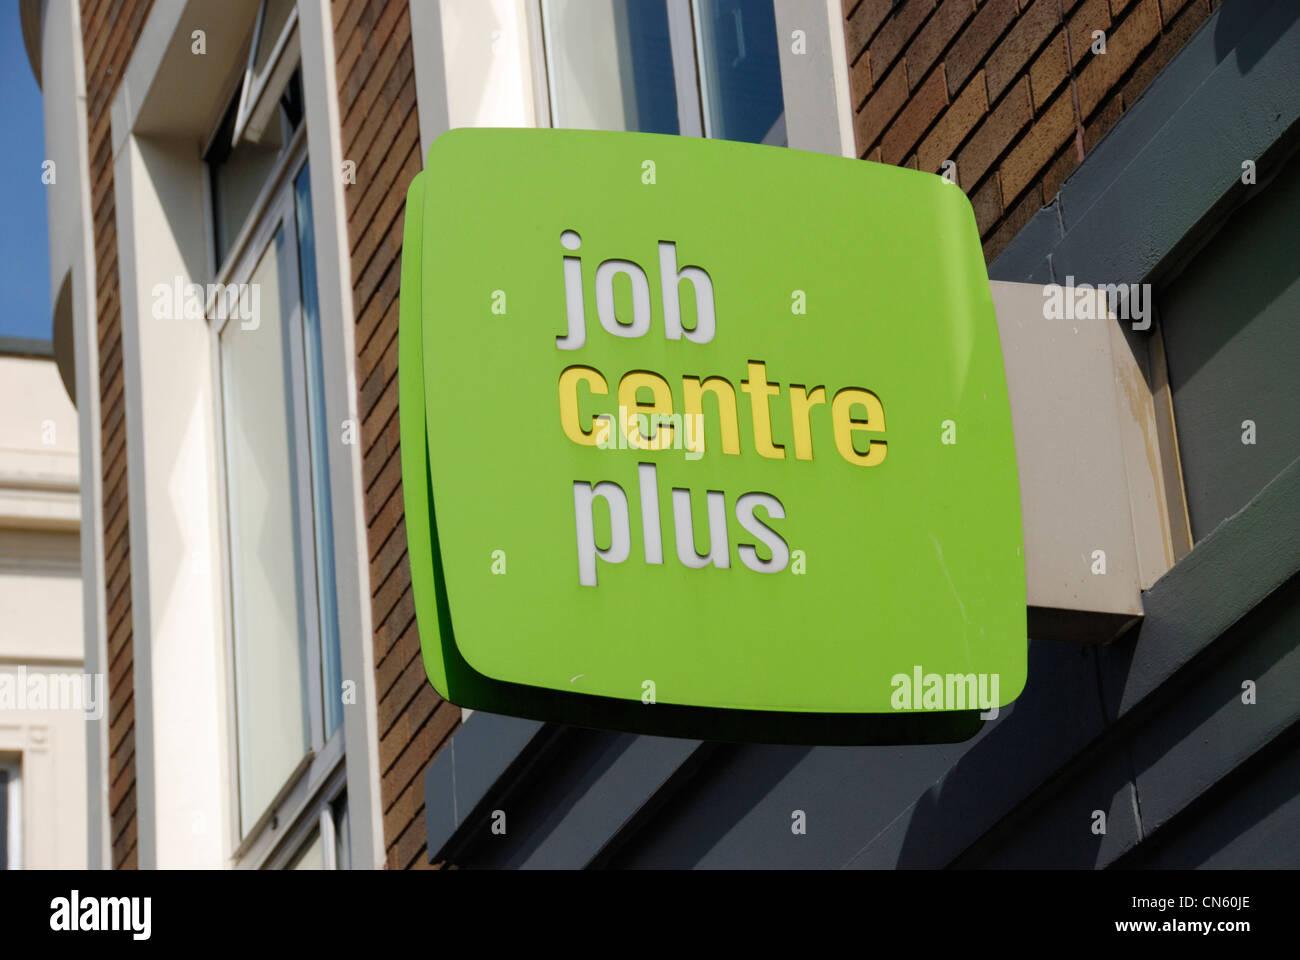 Jobcentre plus sign logoStock Photo